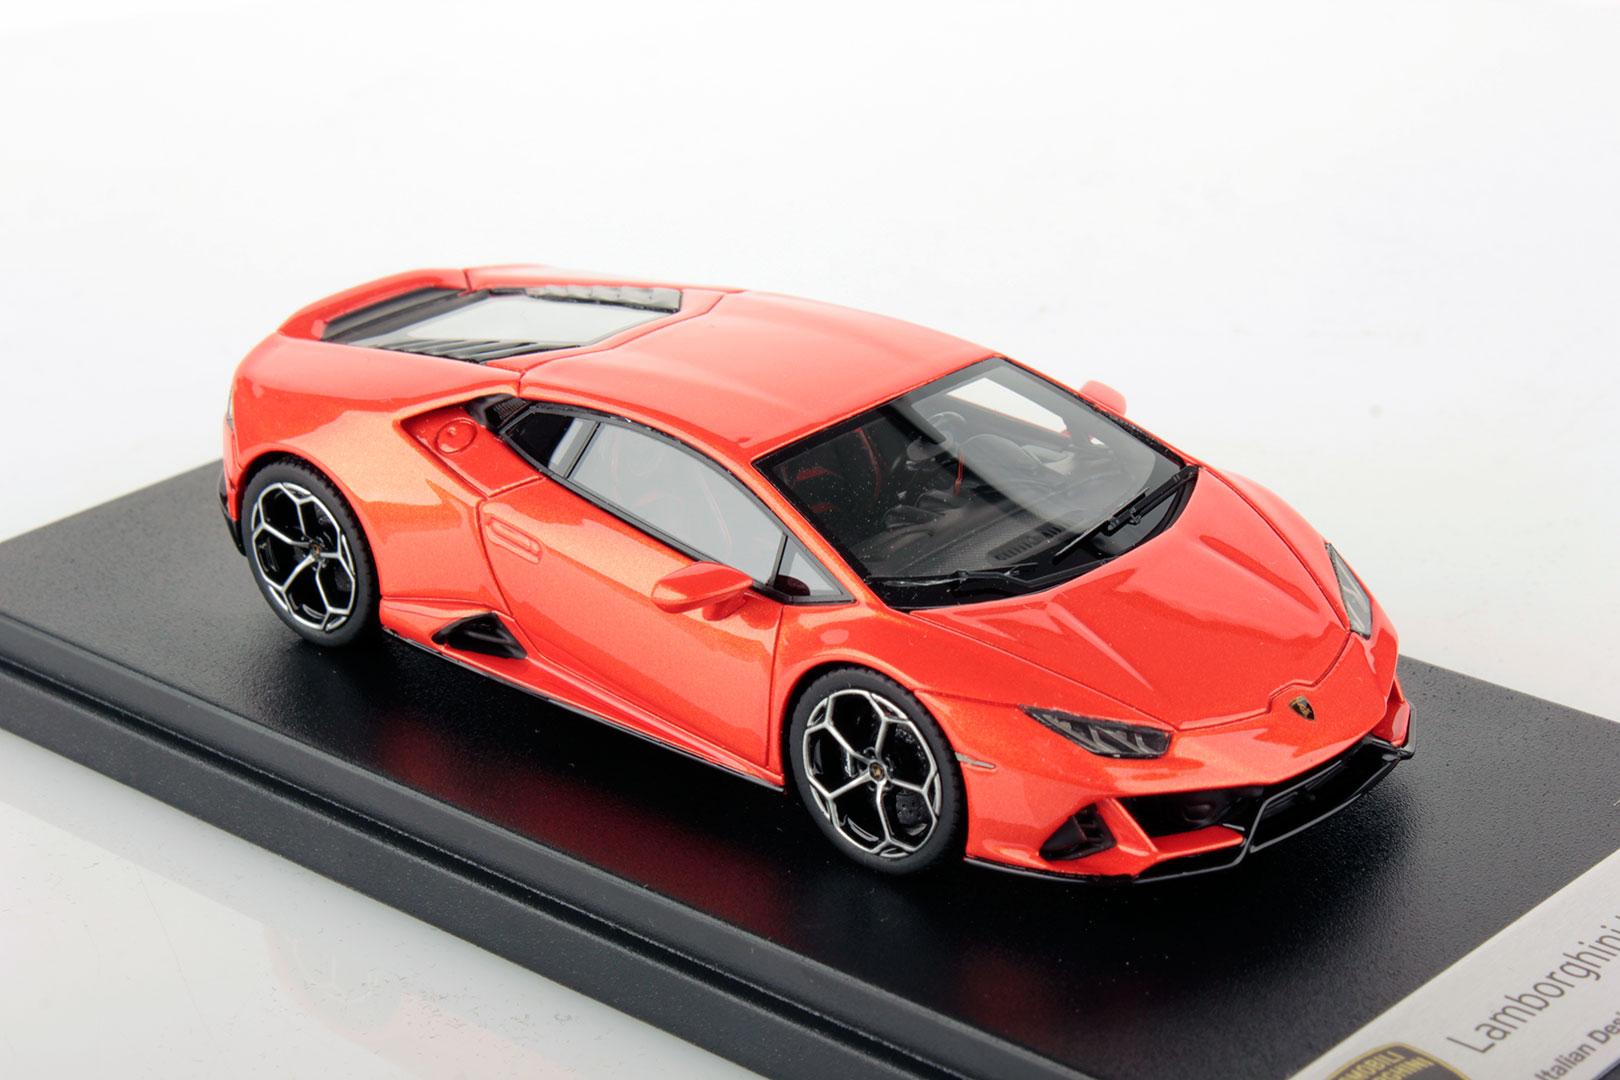 Lamborghini Huracan Evo miniature (4)